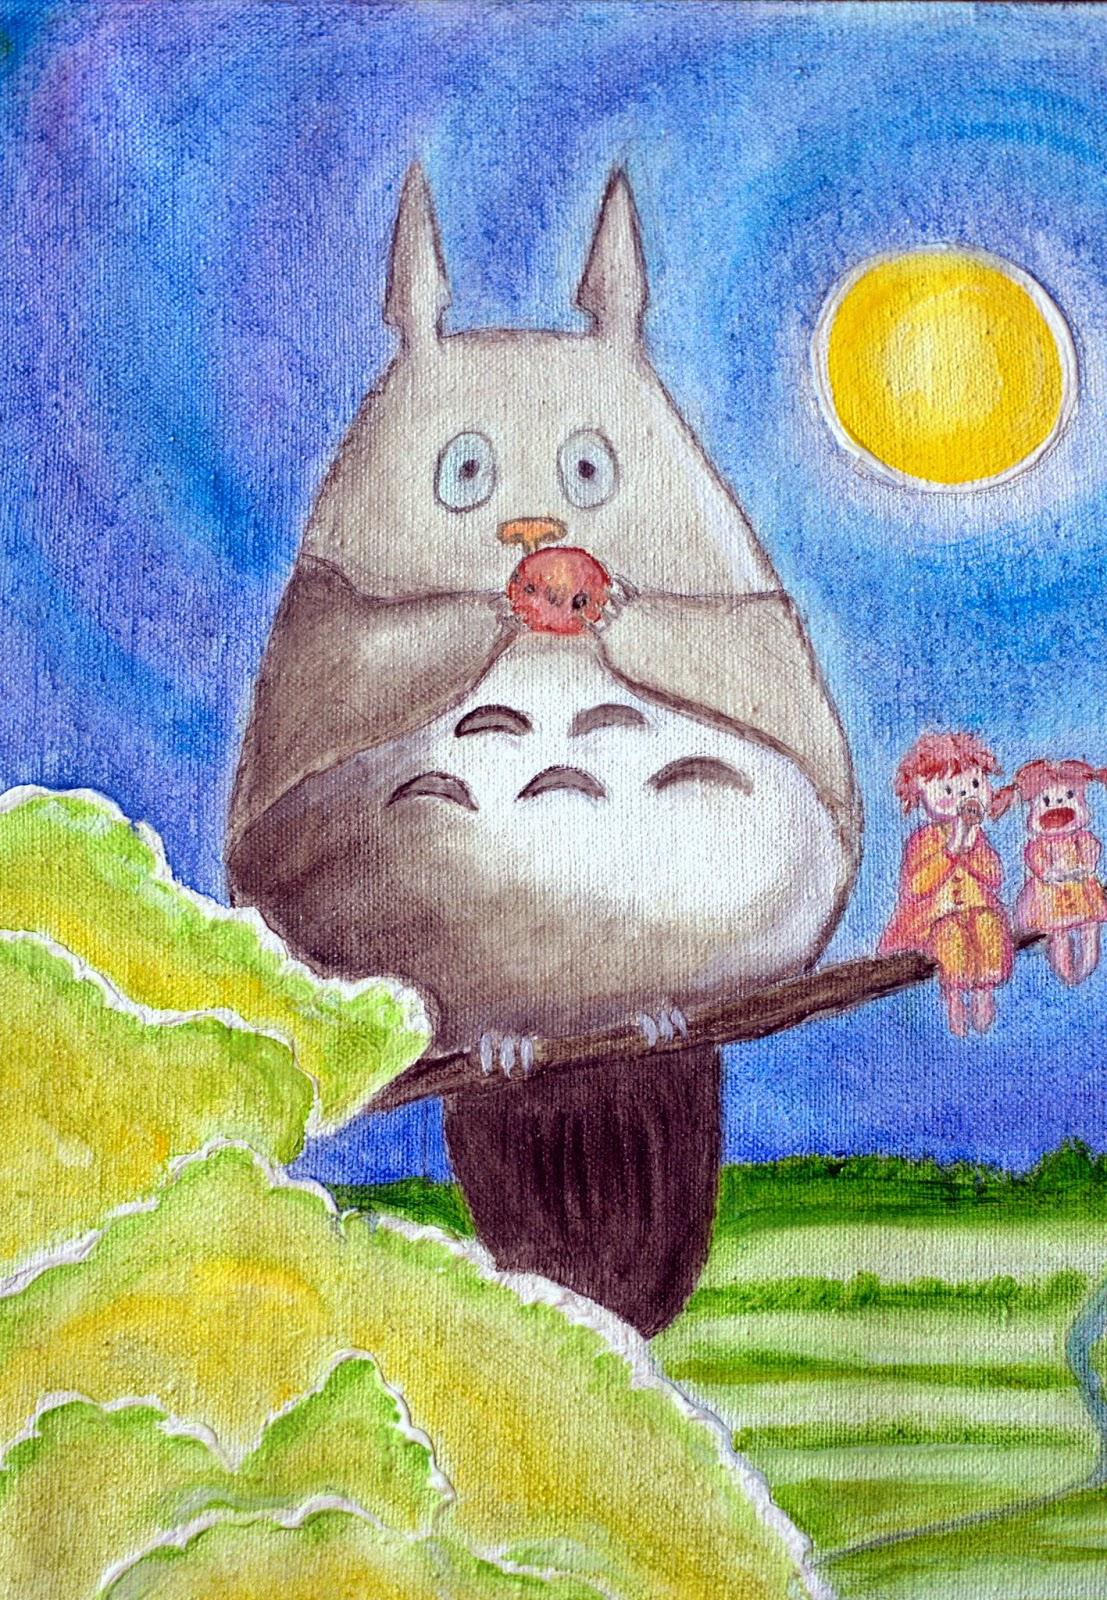 https://picasaweb.google.com/106829846057684010607/Totoro#6045669540180613810